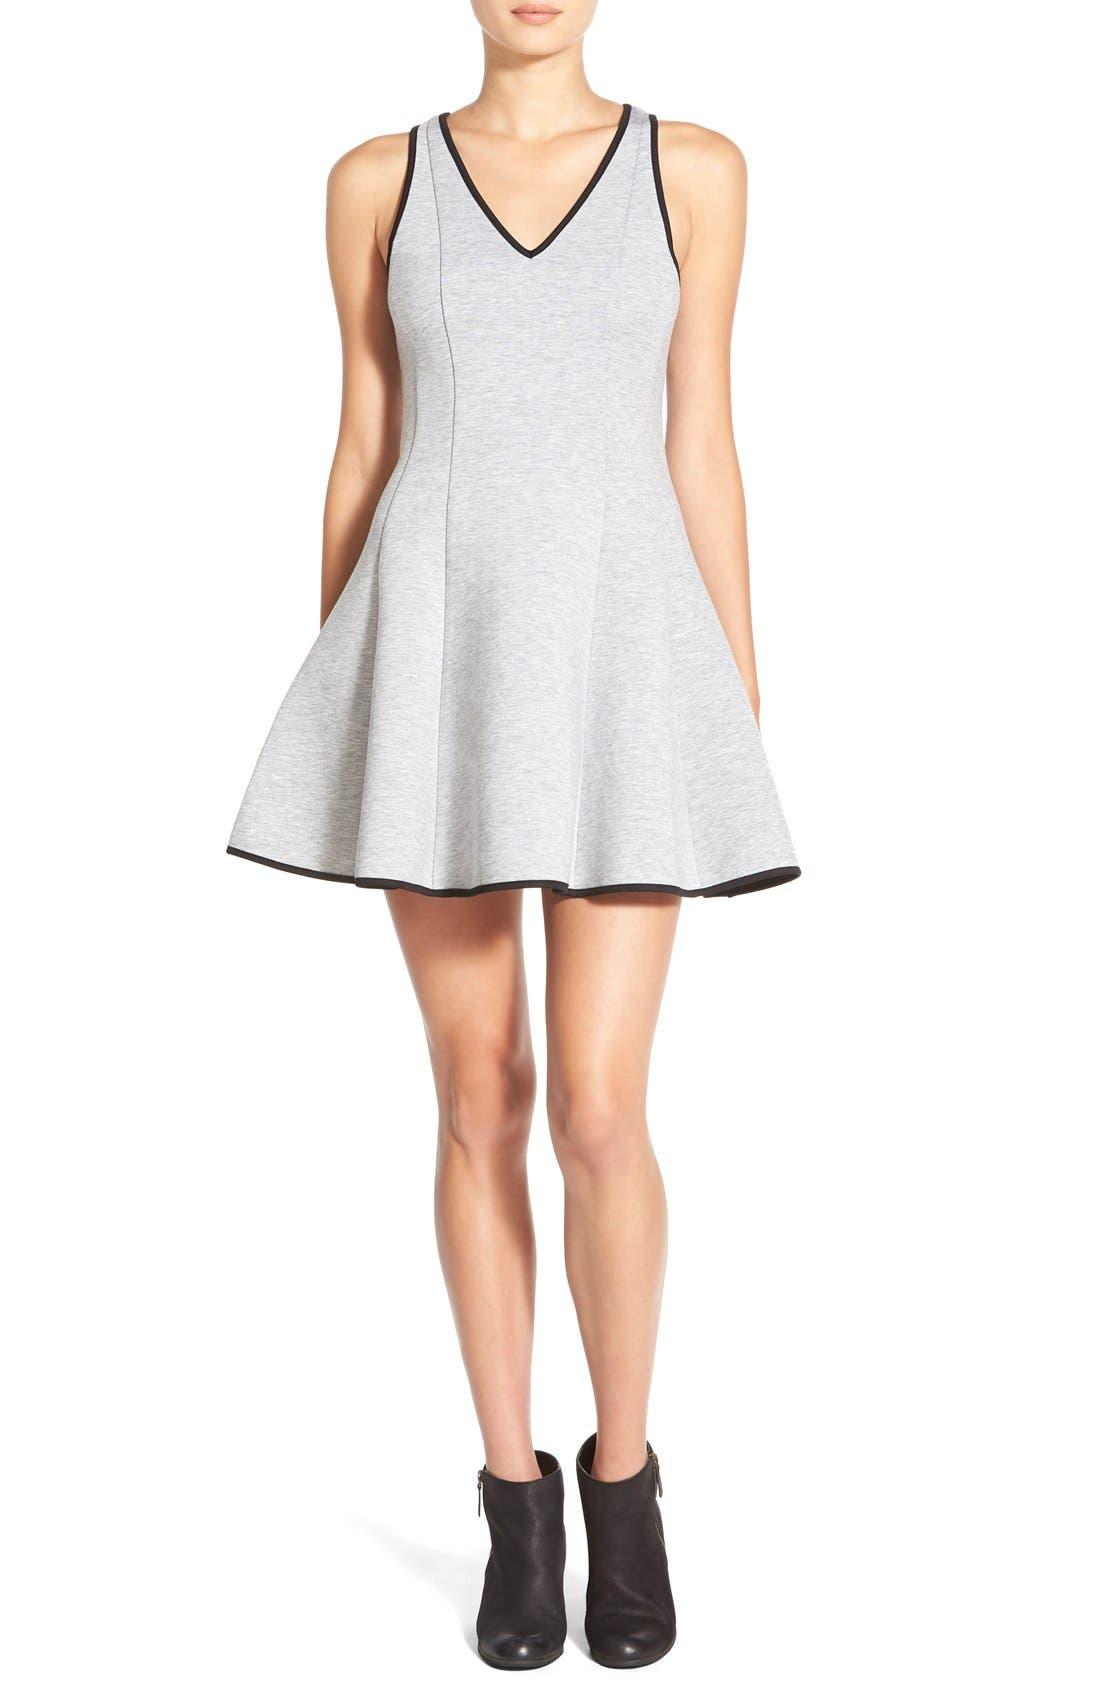 ModisteDresses Knit Fit & Flare Dress,                             Main thumbnail 1, color,                             020